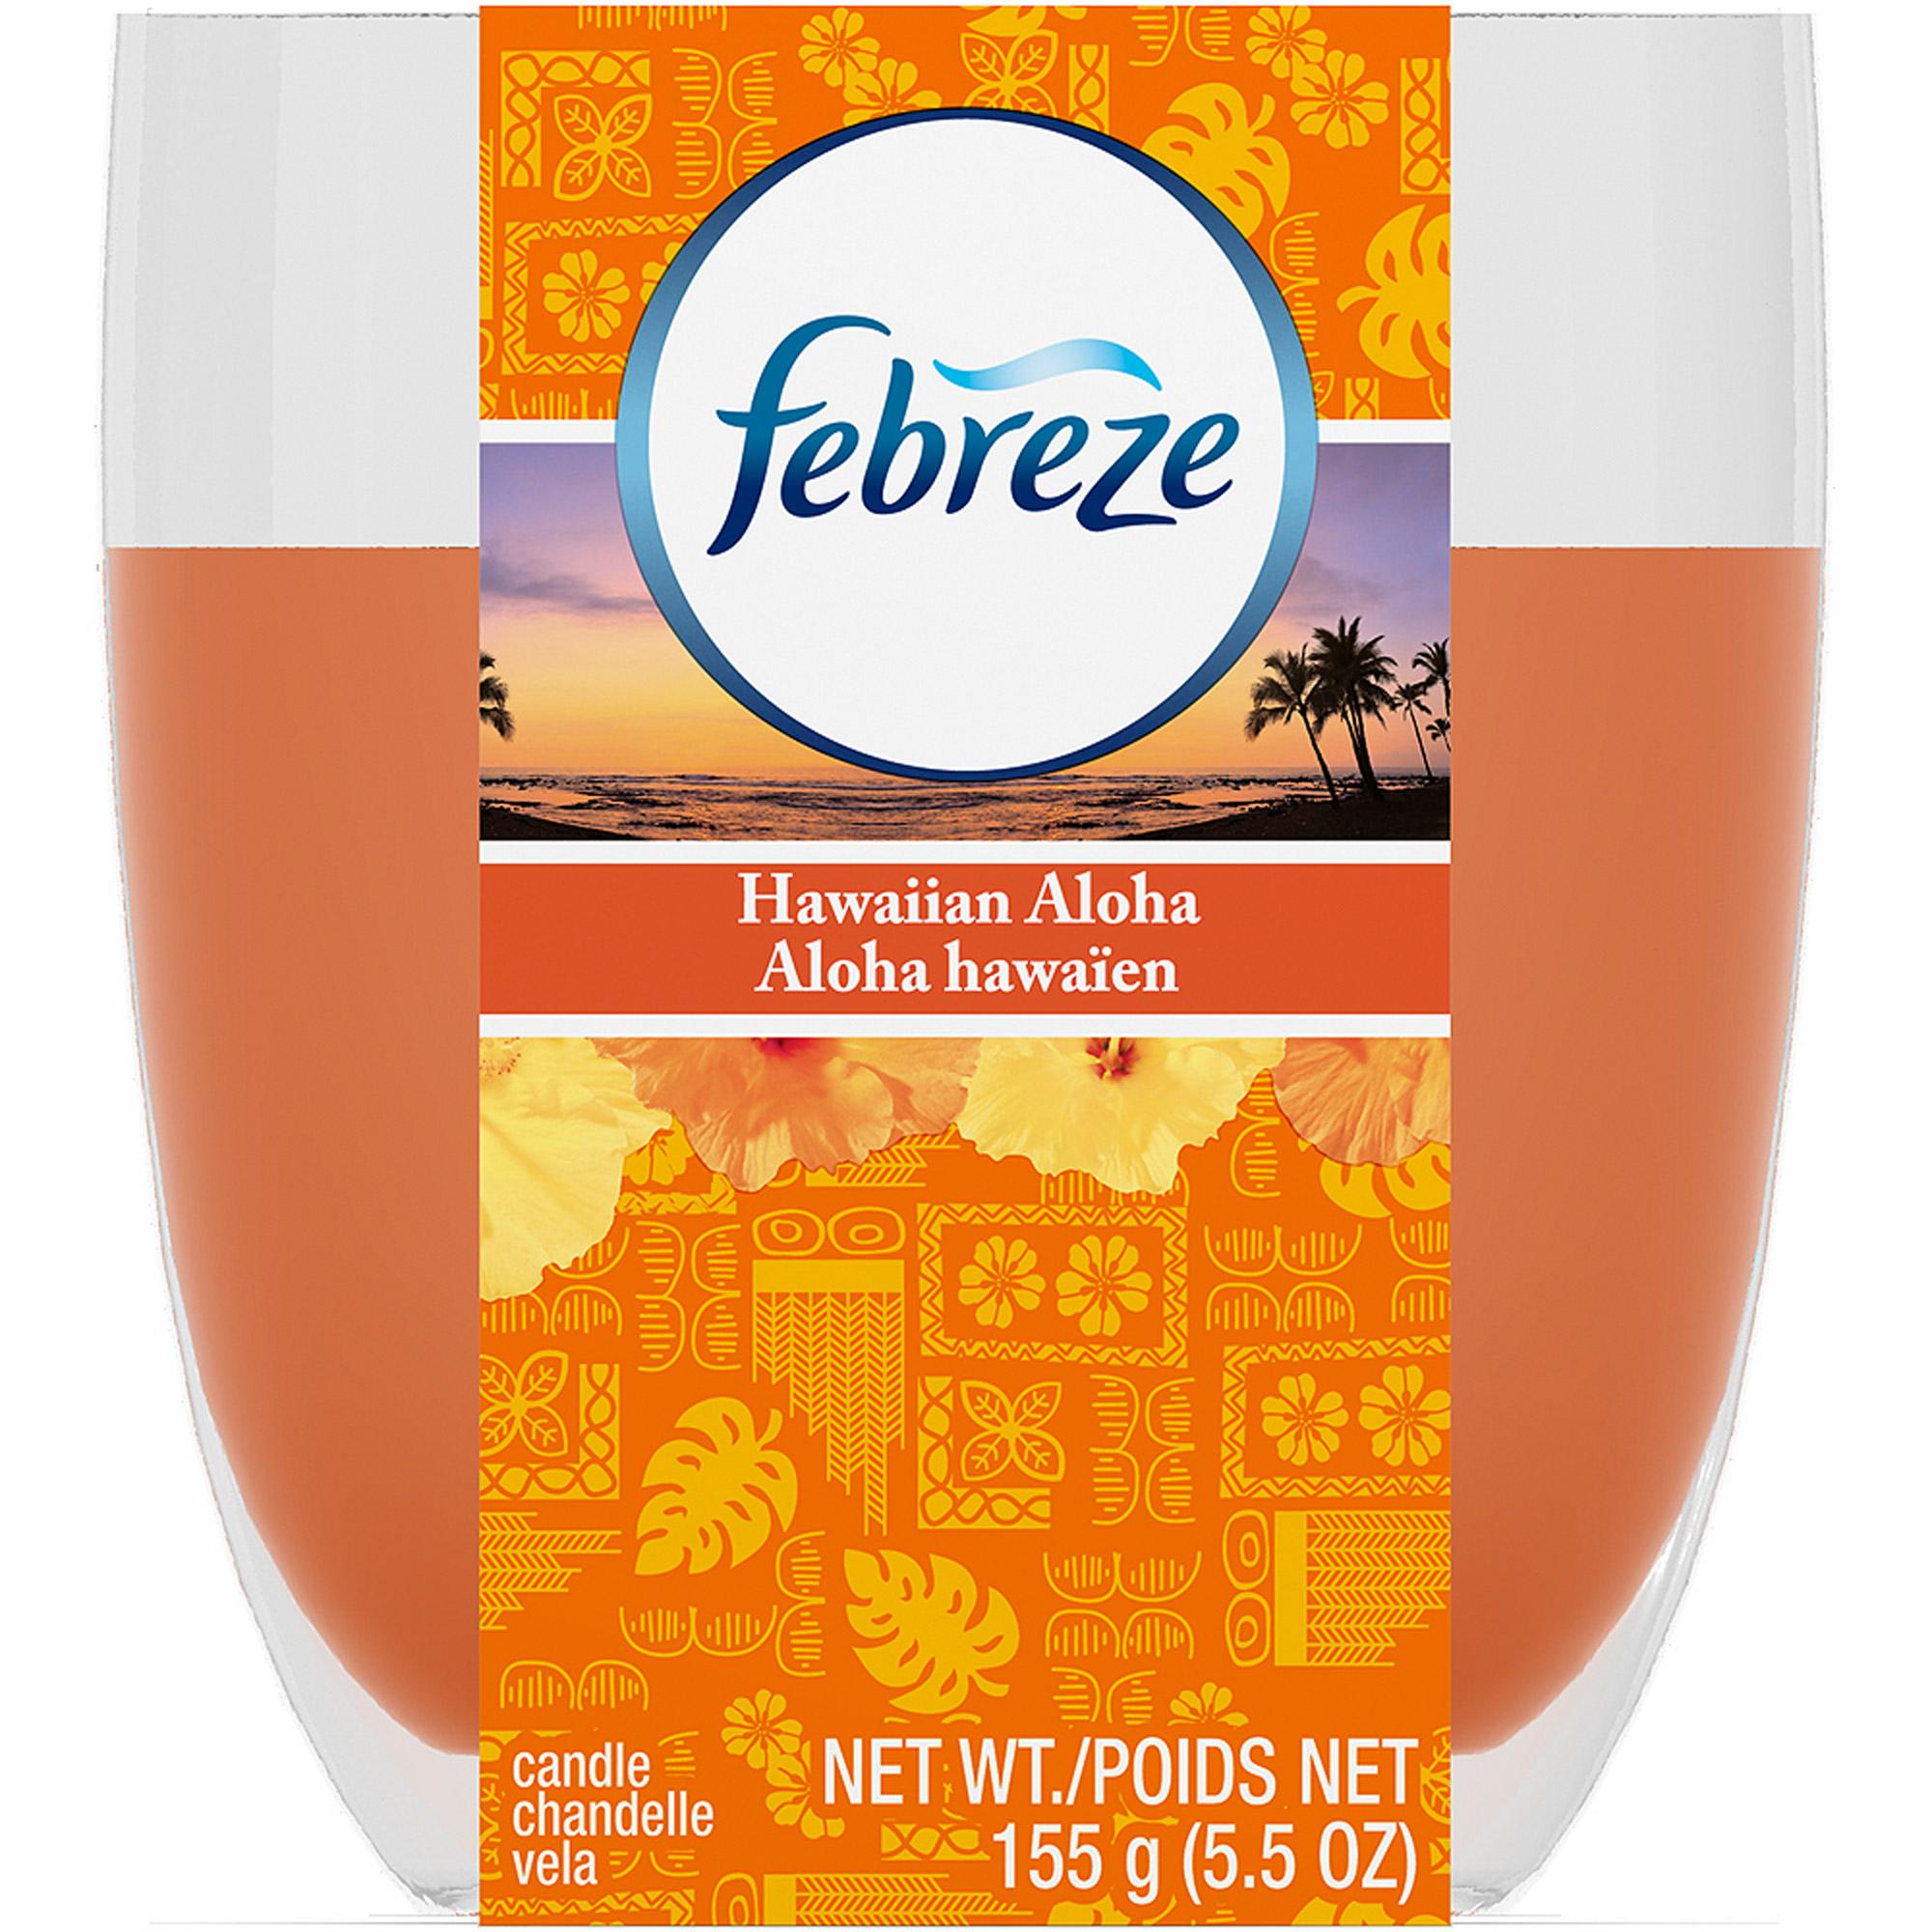 Febreze Candle Hawaiian Aloha Air Freshener (5.5 oz)